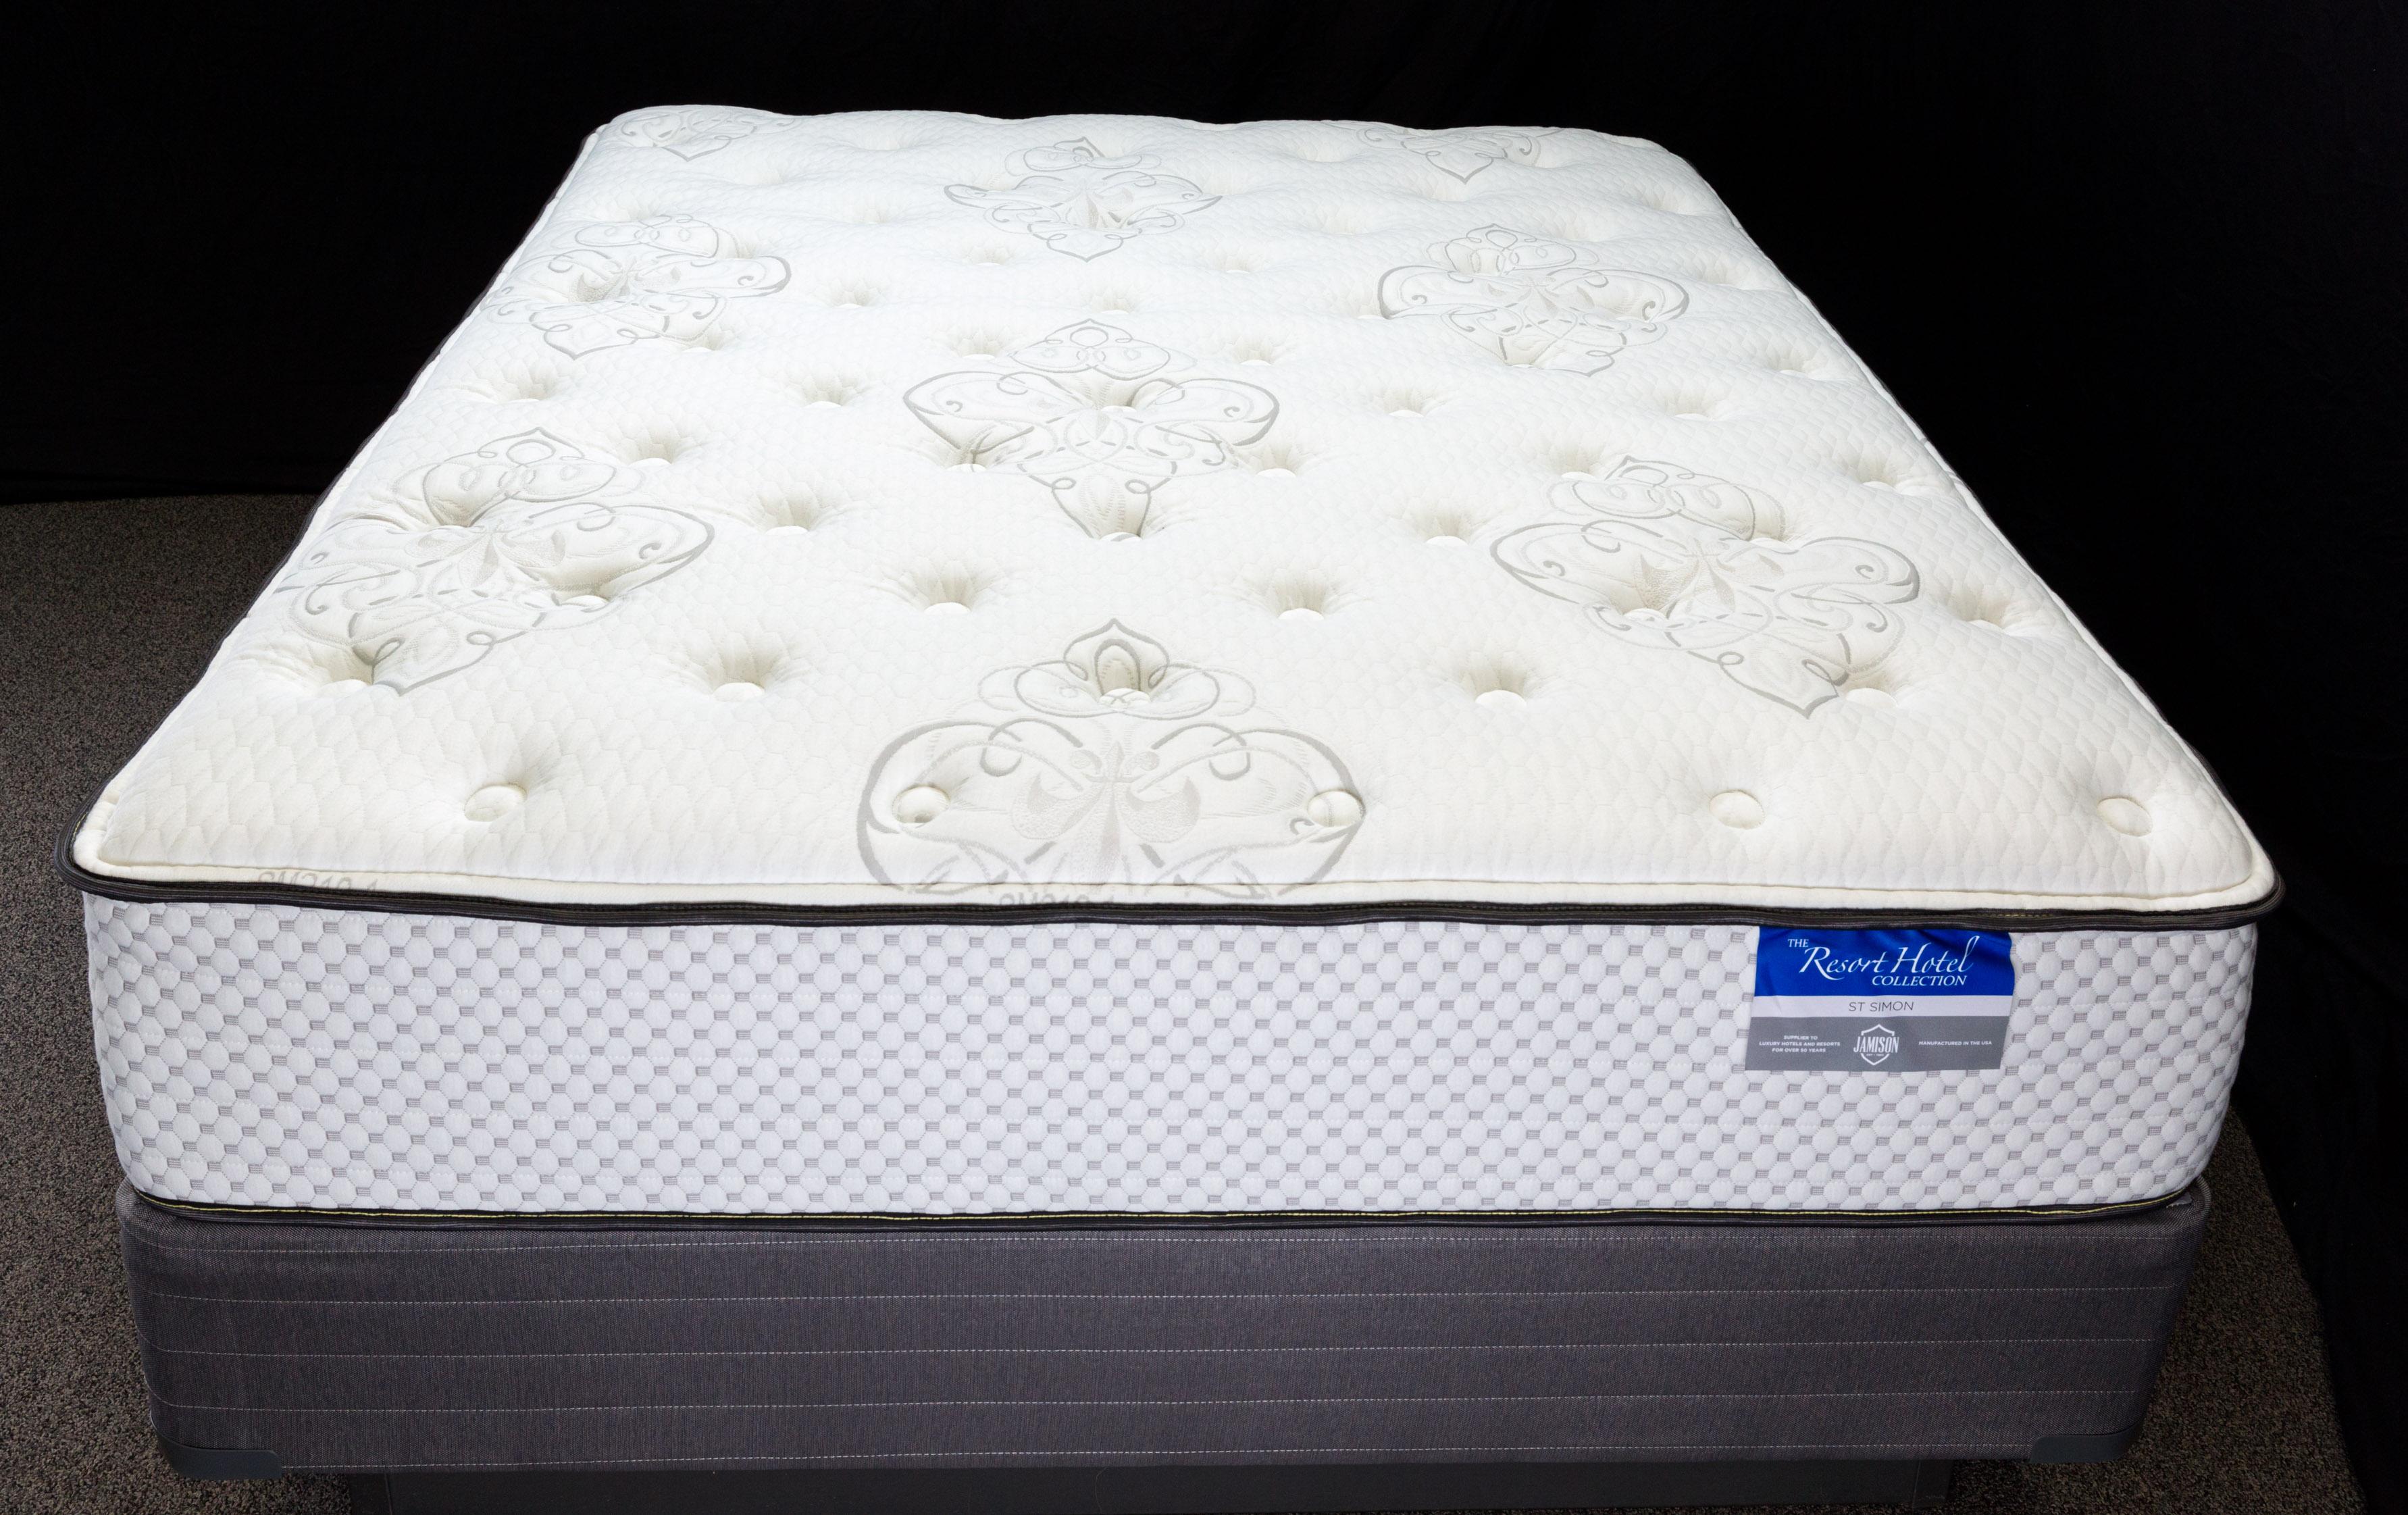 firm king american presidential freight mattress jamison luxury